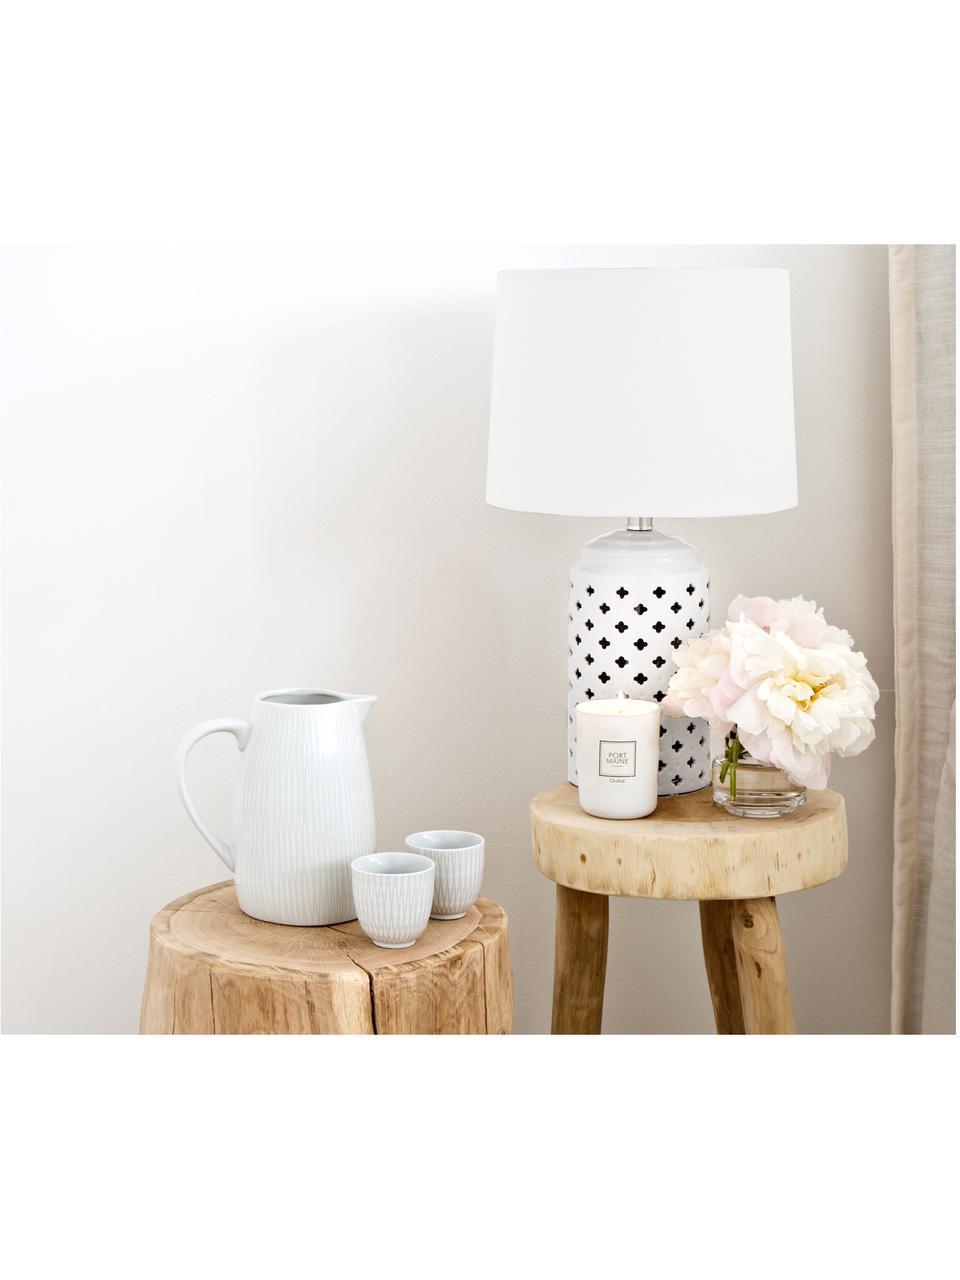 Keramik-Tischlampe Naomi, Lampenschirm: Textil, Lampenfuß: Keramik, Weiß, Ø 28 x H 52 cm